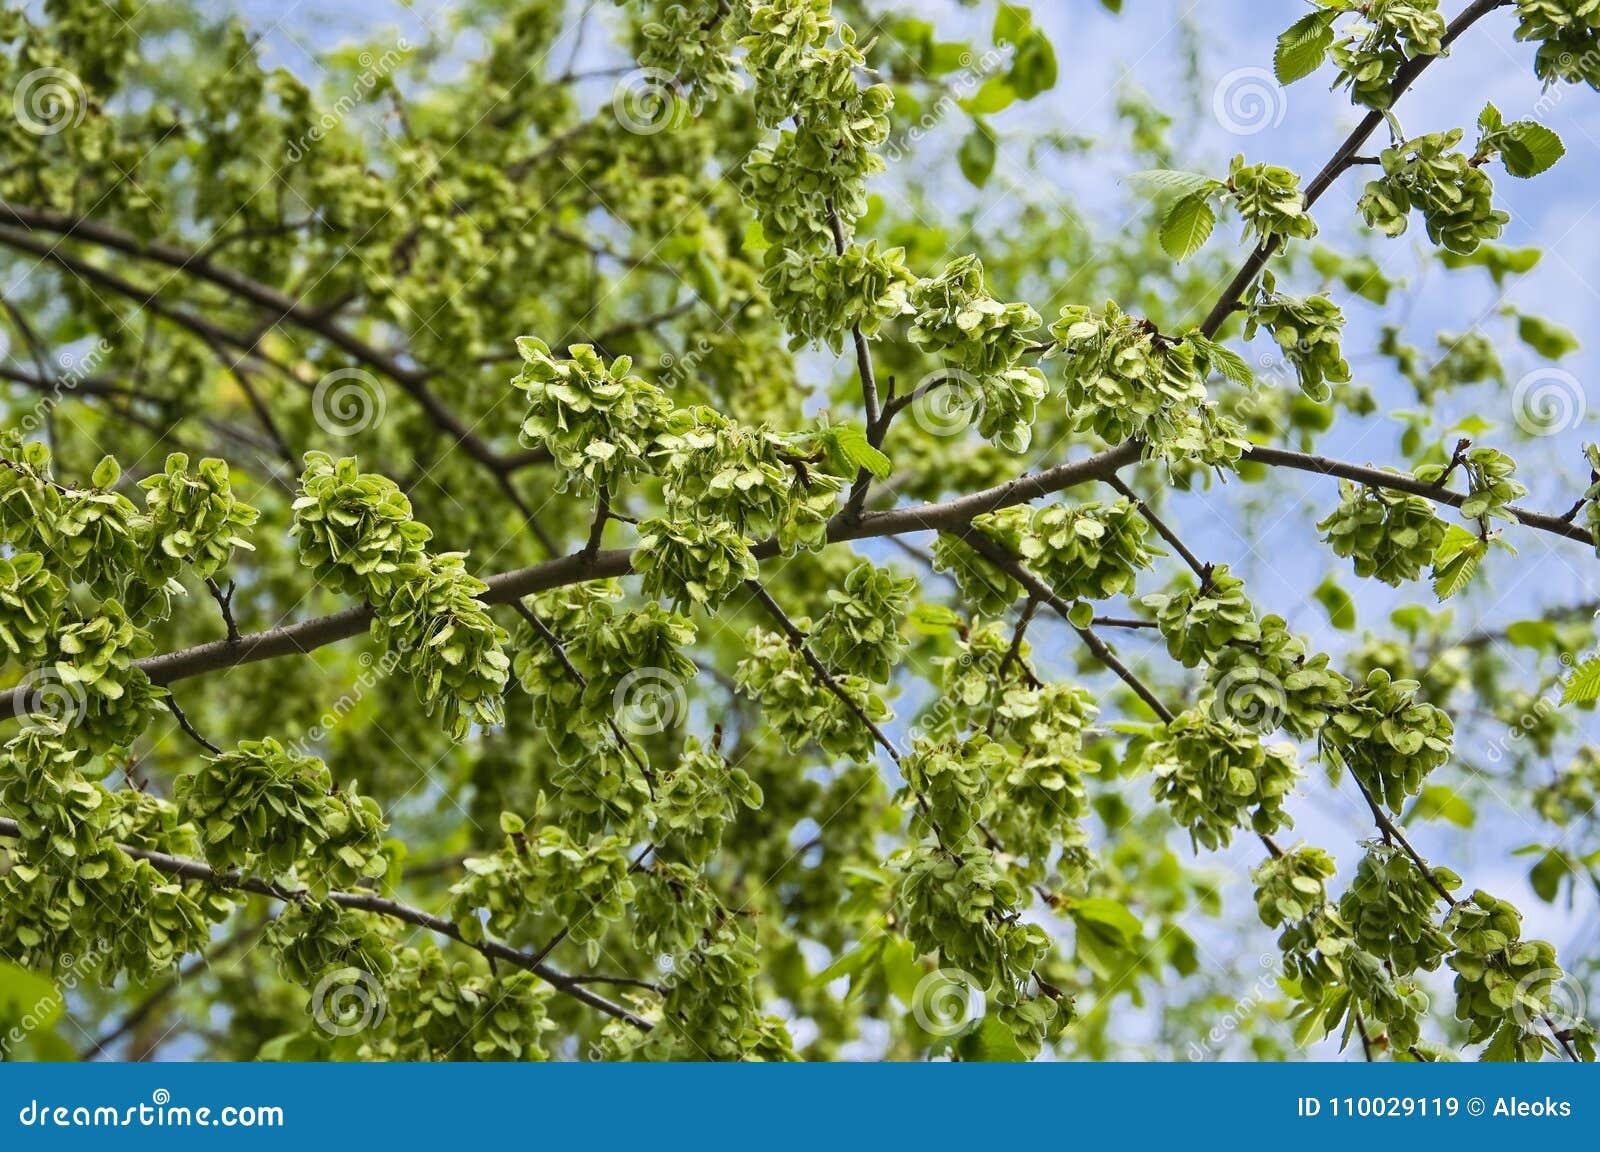 Het groene fruit, rond wind-verspreide samara van de iep Ulmus